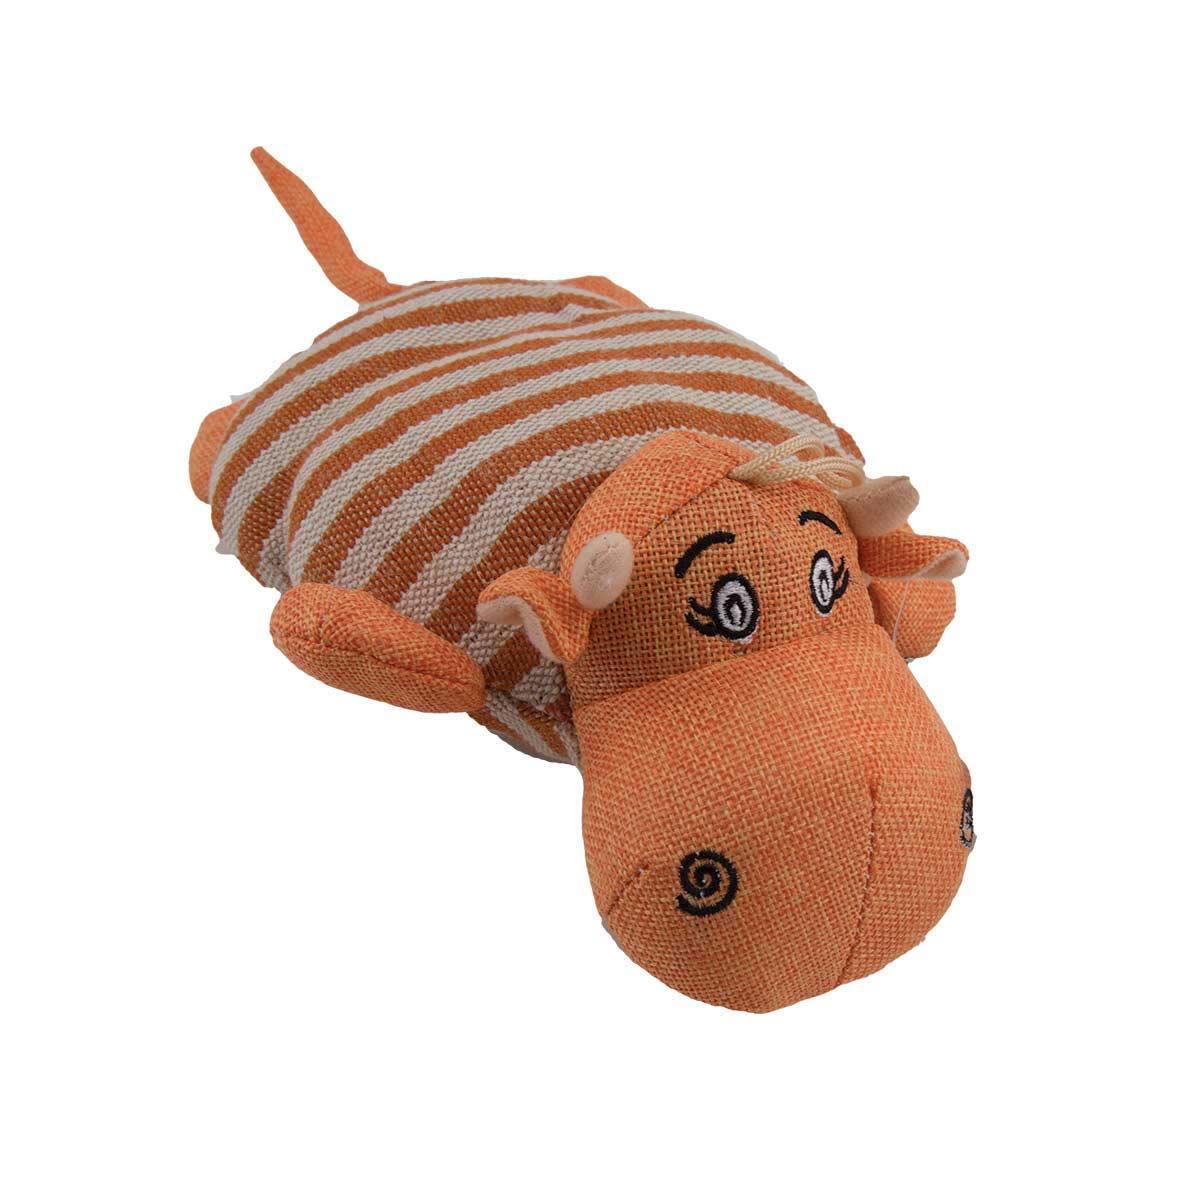 8 inch Orange Dawgeee Toy Assorted Animals